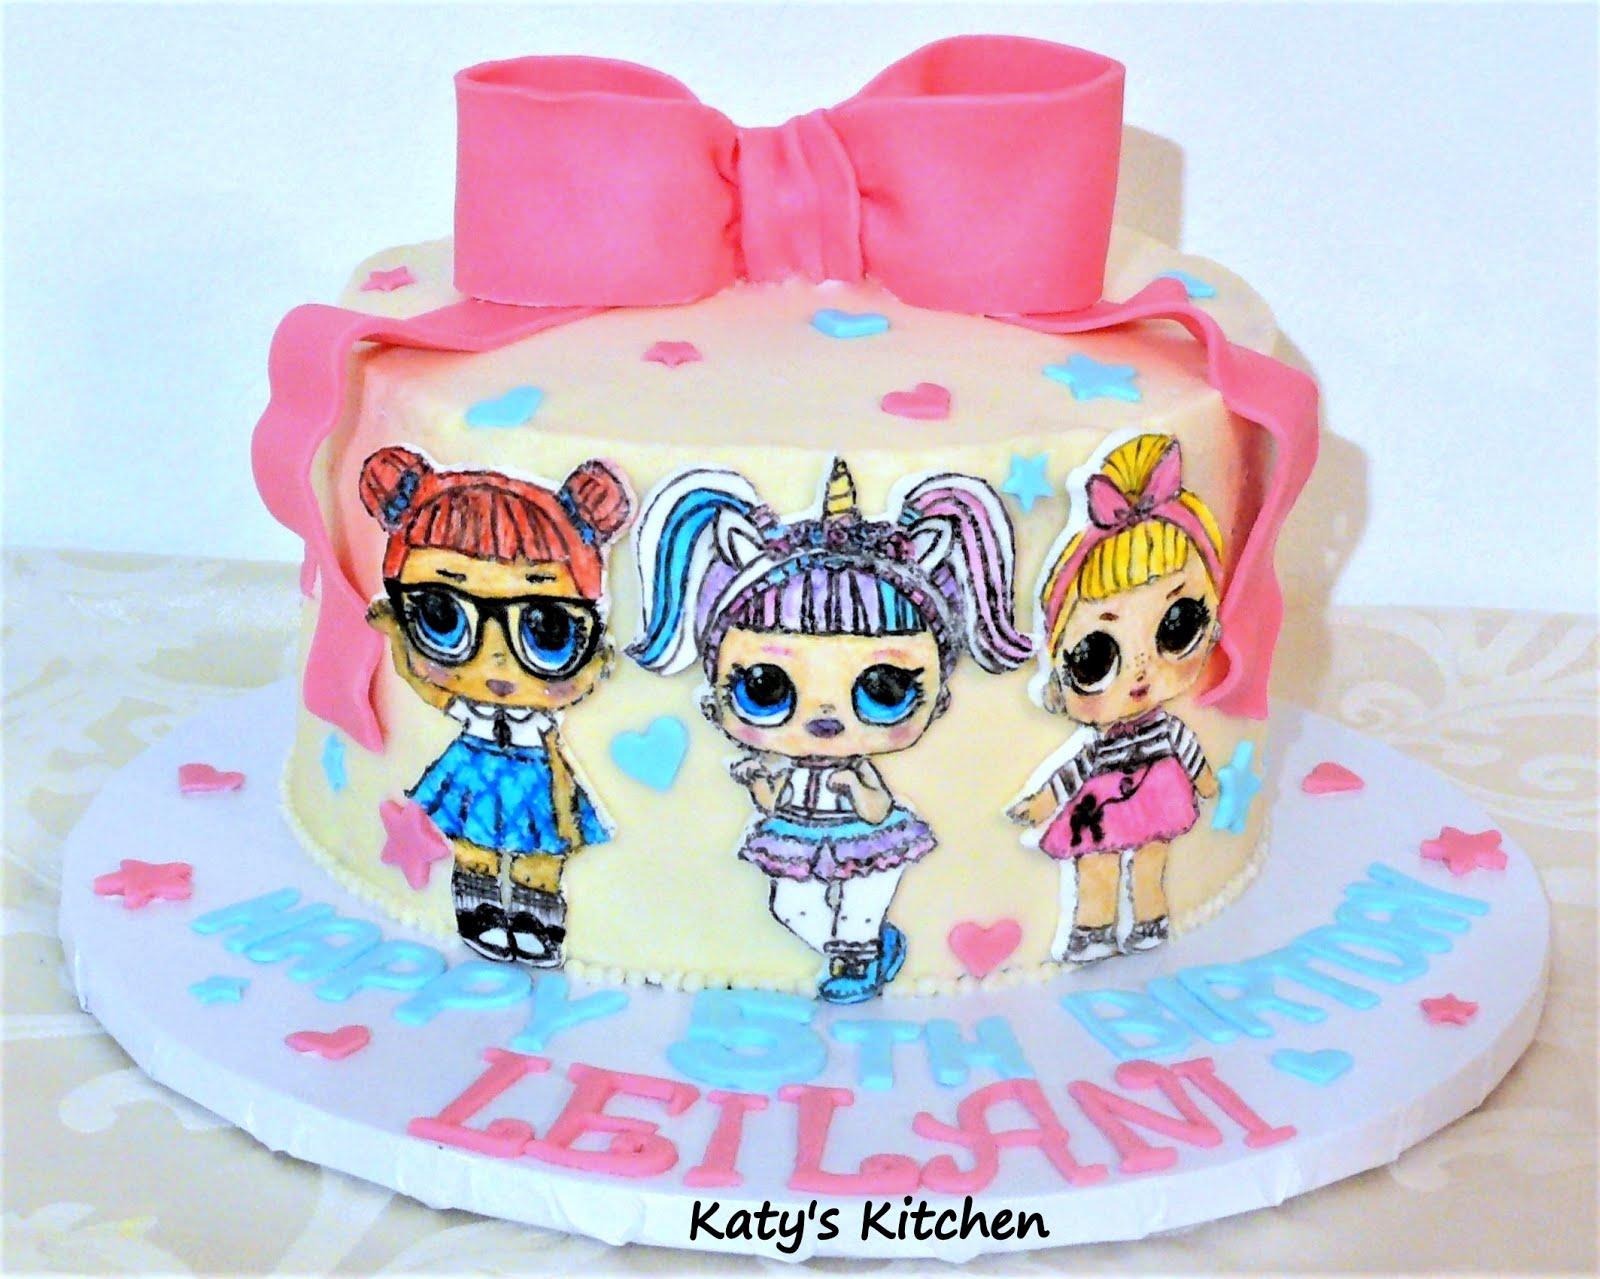 Katys Kitchen LOL Surprise Doll Cake